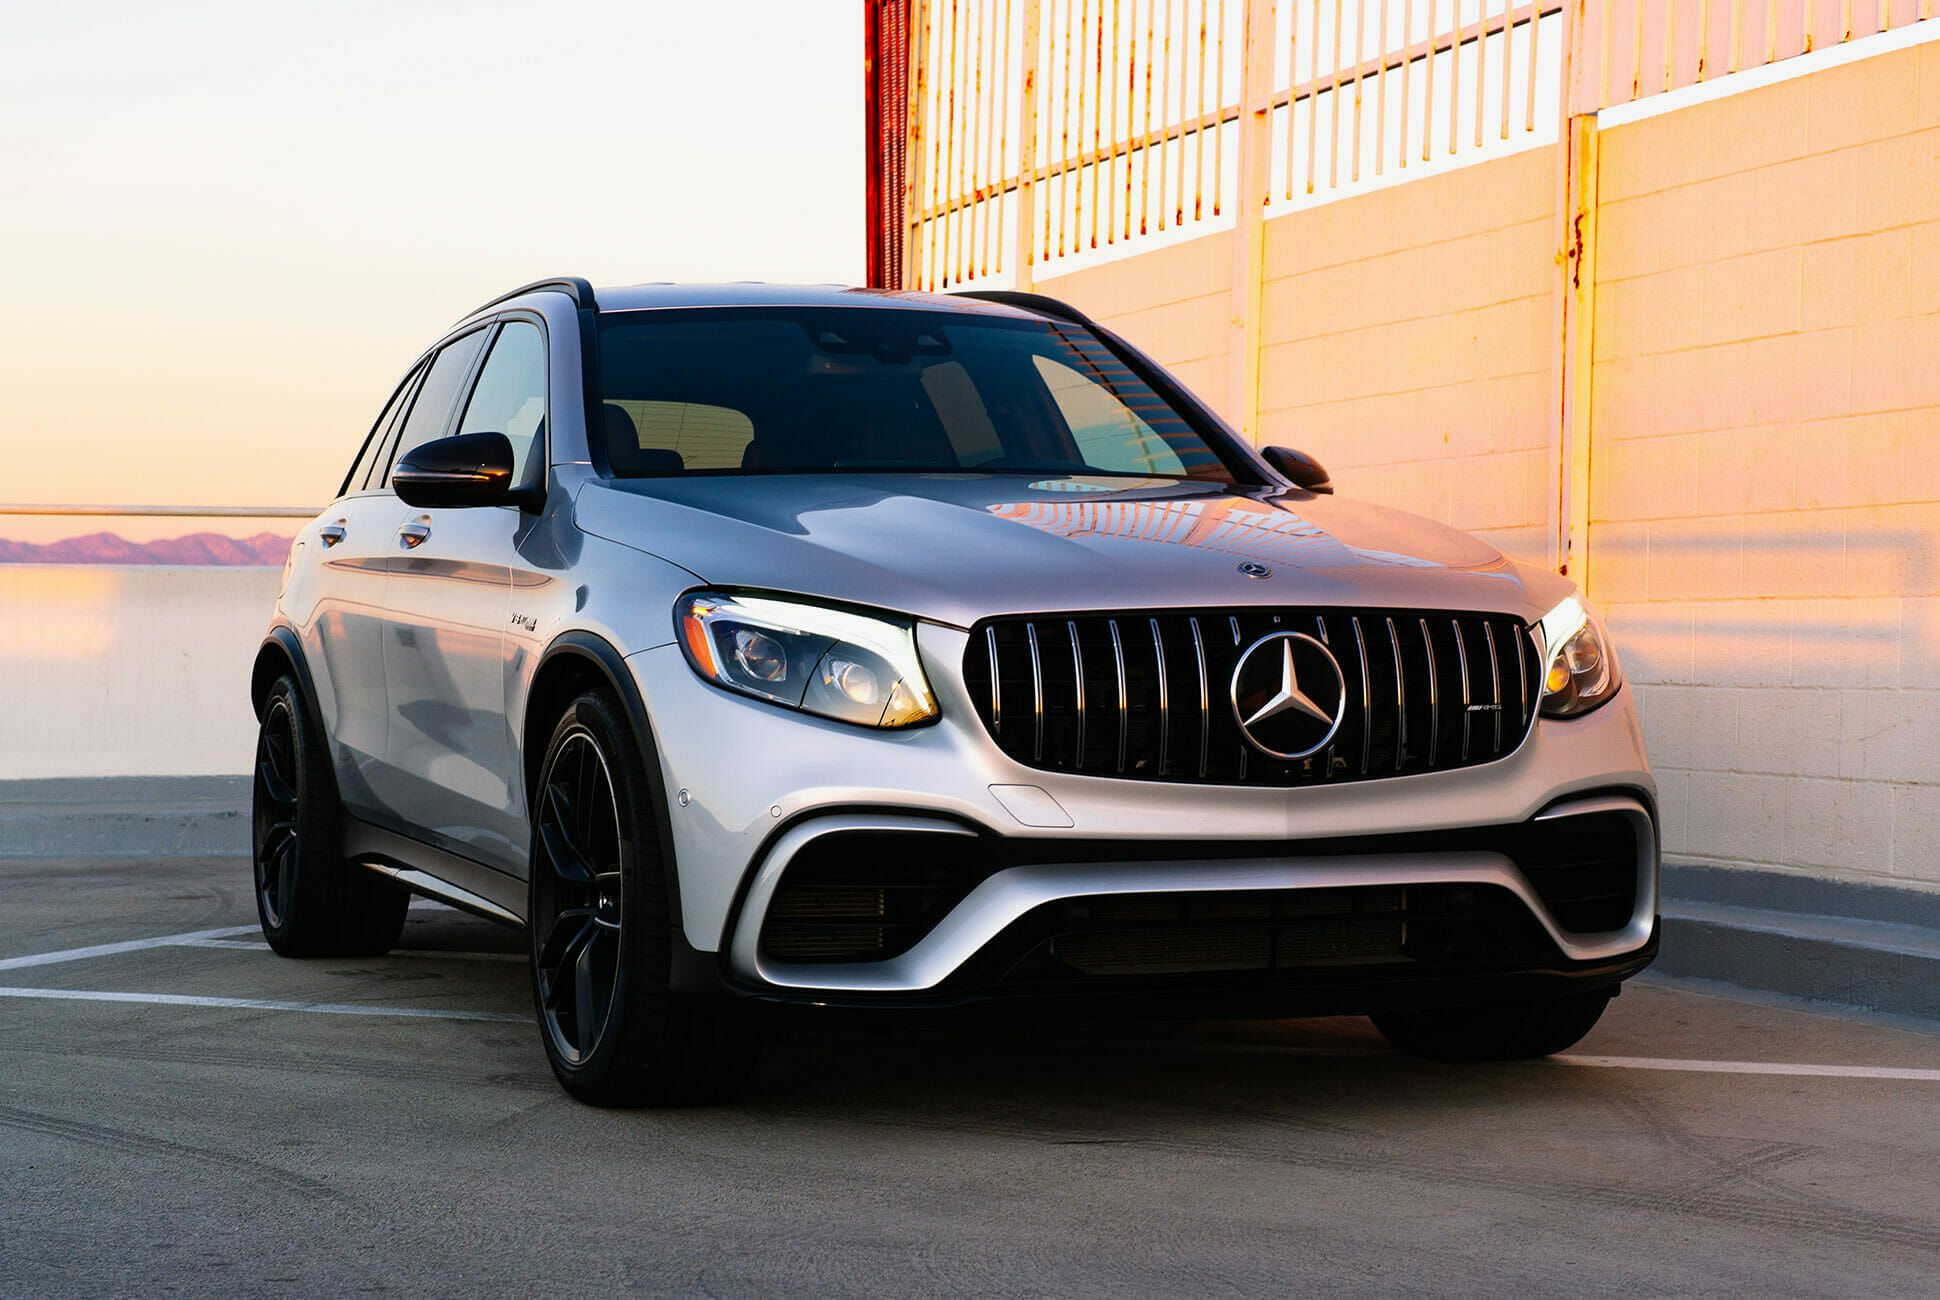 2020 Mercedes Glc 2020 Reviews Mercedes Benz Glc Mercedes Amg